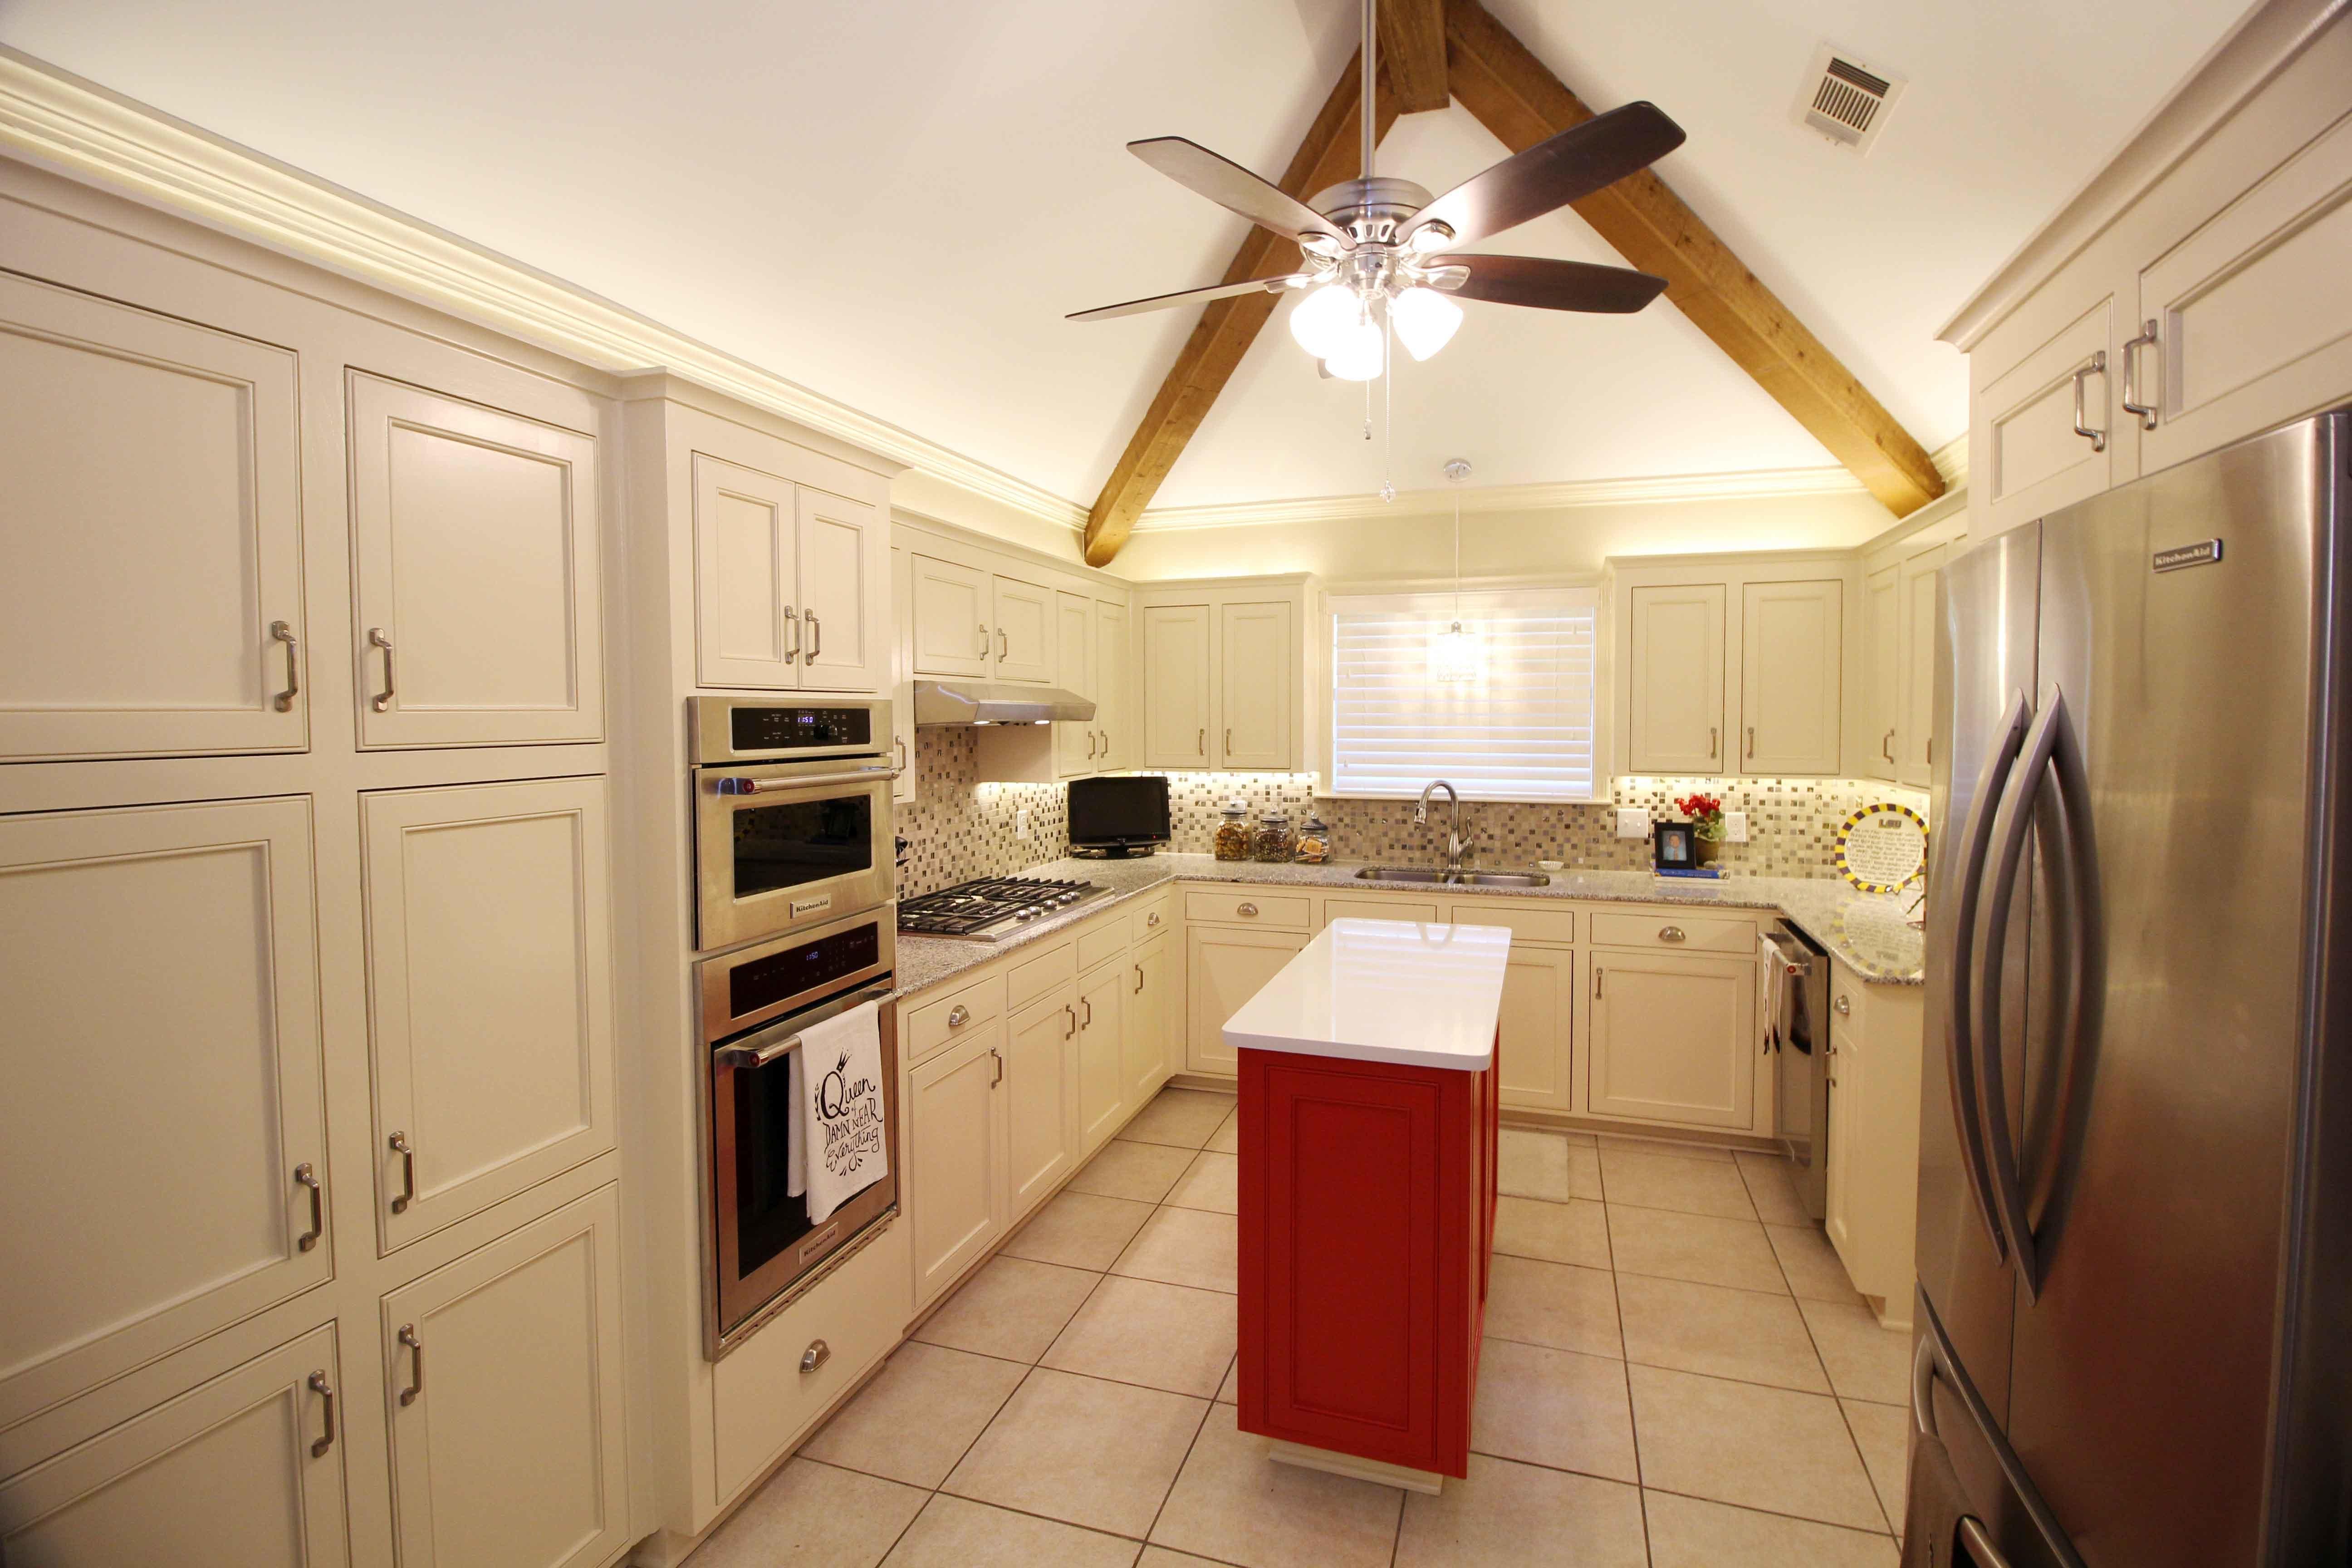 Showcase Homes & Remodeling LLC image 1